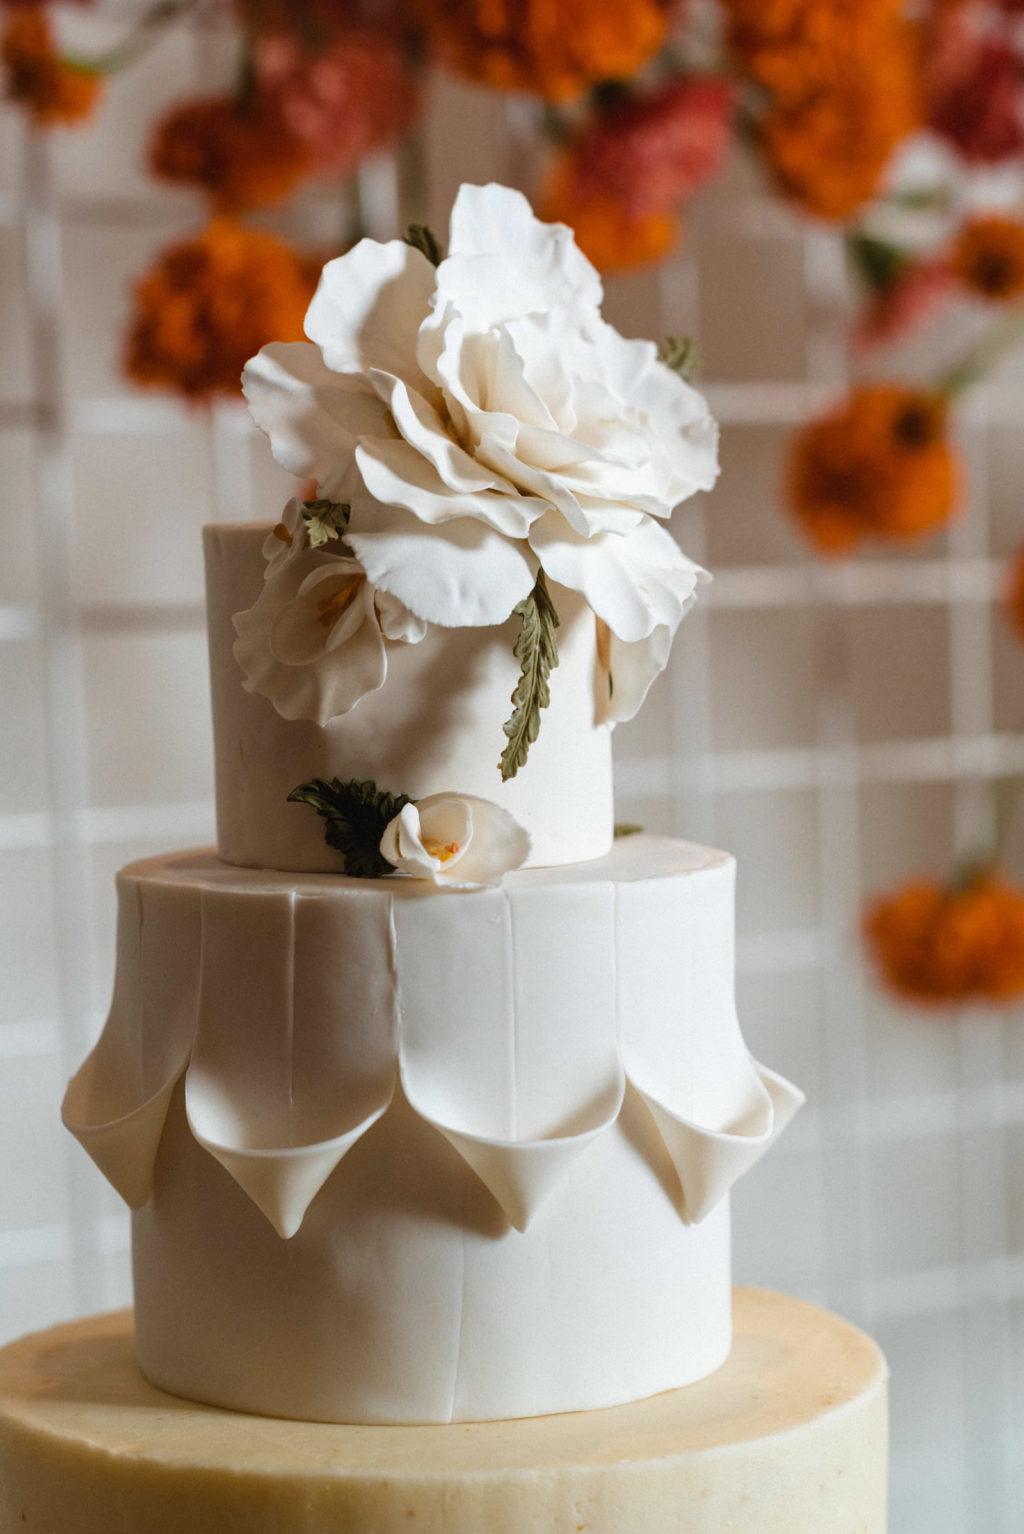 White Textured Wedding Cake with Sugar Flower Cake Topper